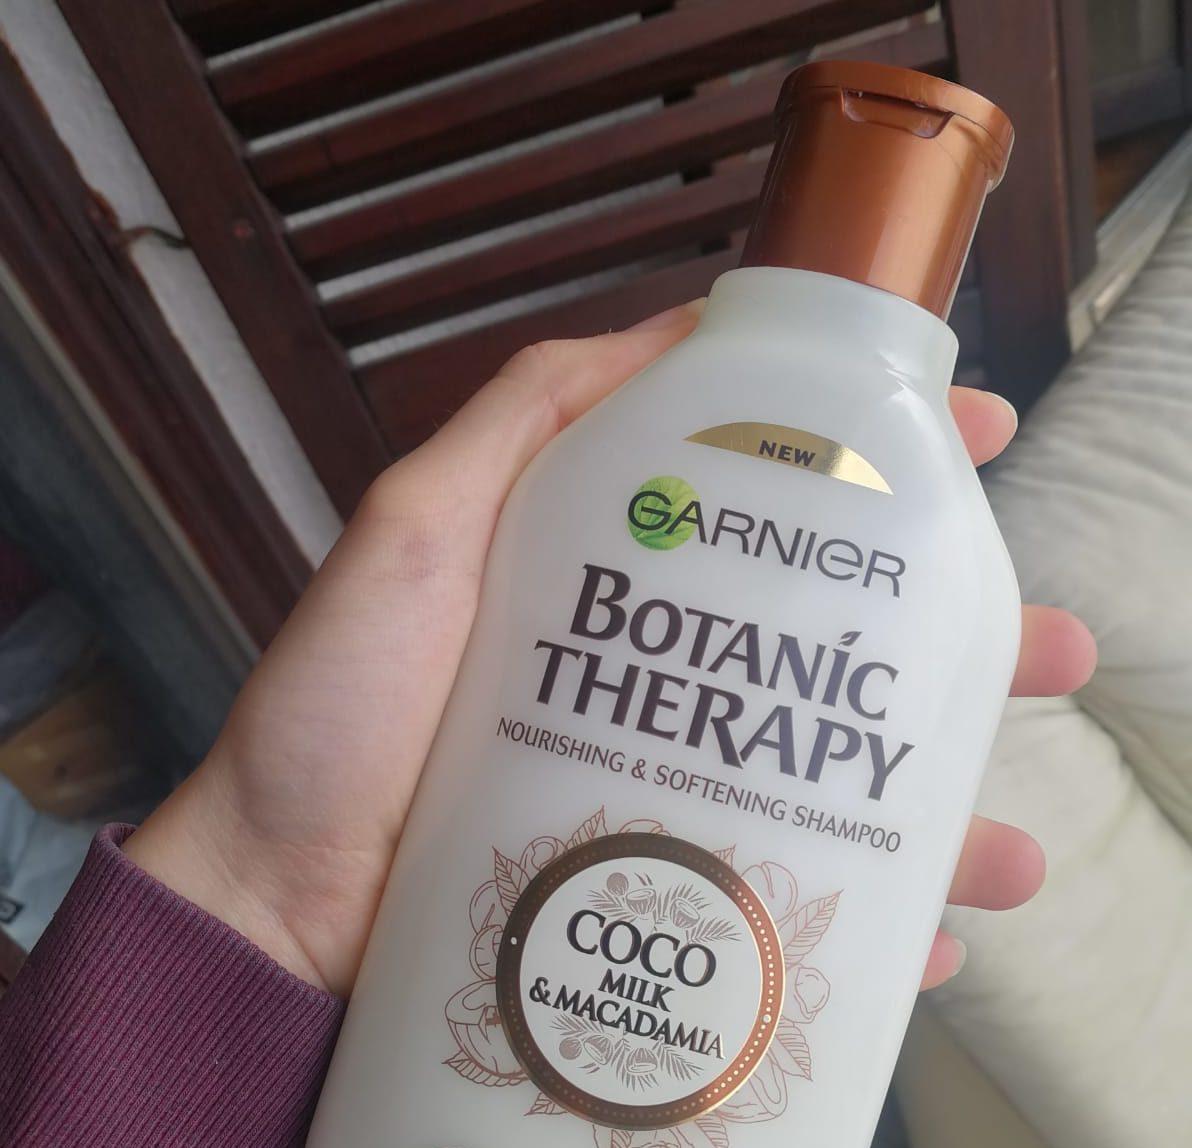 Garnier Botanic Therapy šampon recenzija